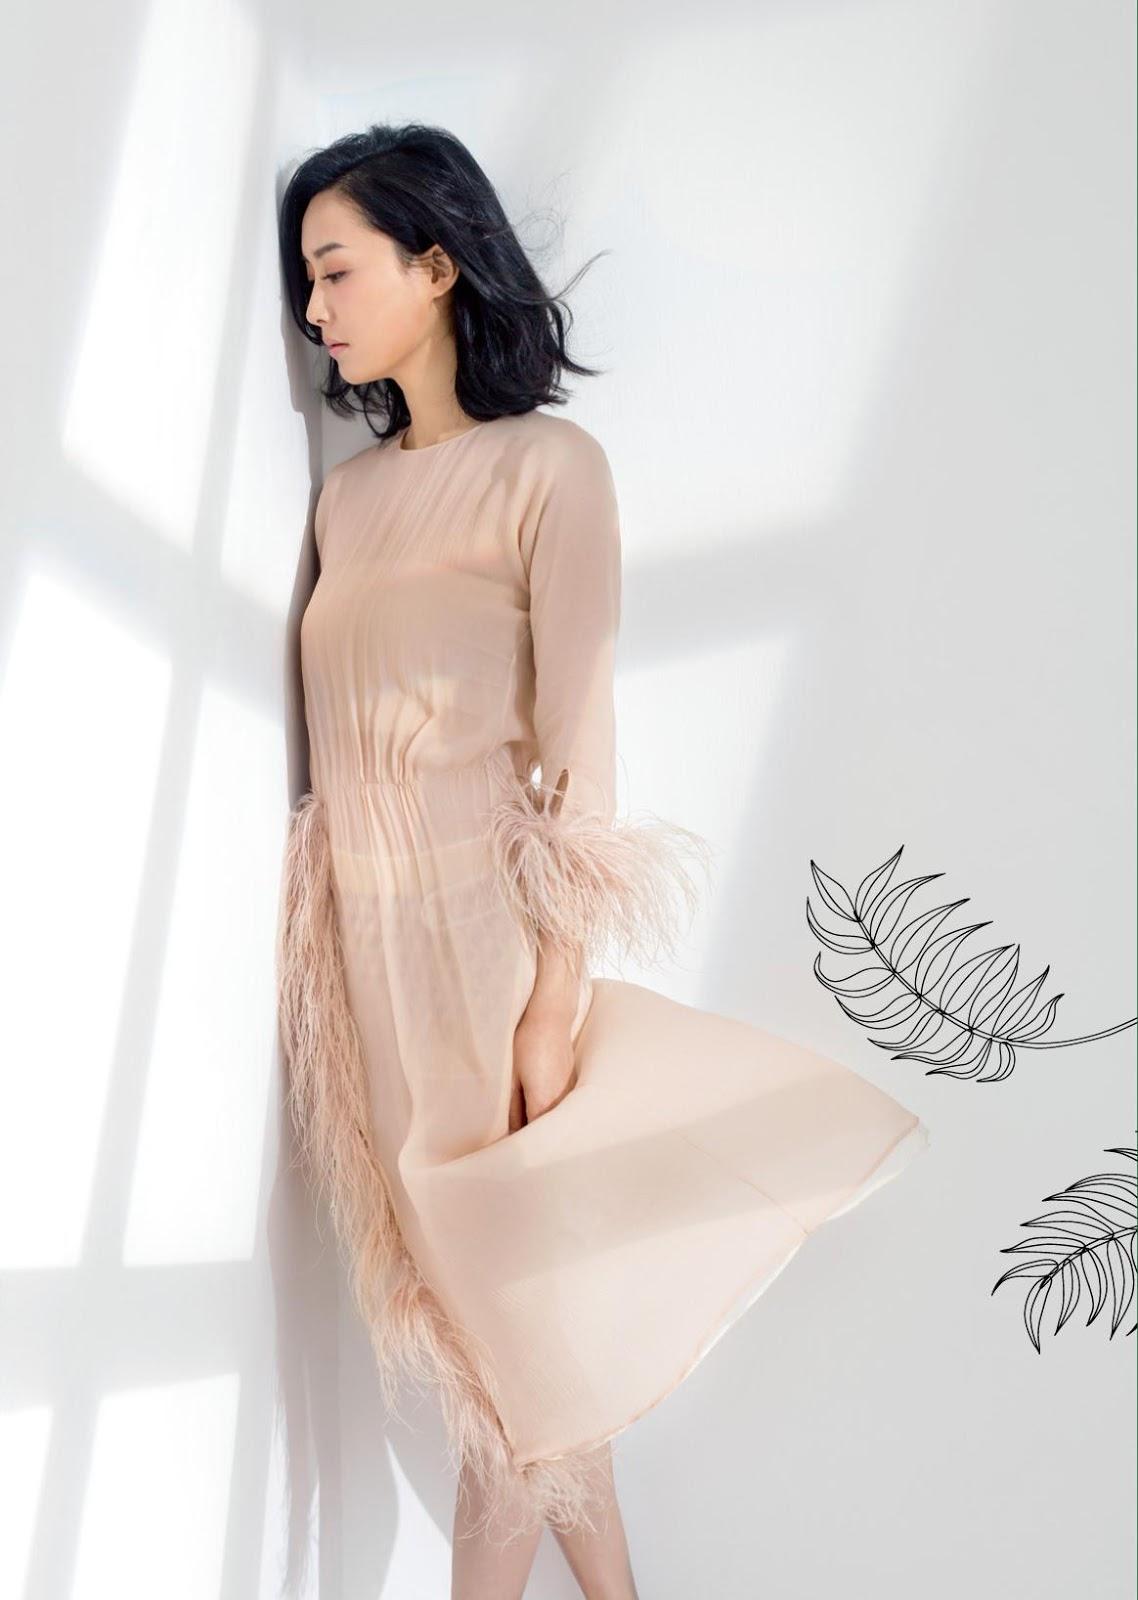 eyval.net: 王君馨, Grace Wong Kwan-Hing : Cosmopolitan Hong ...